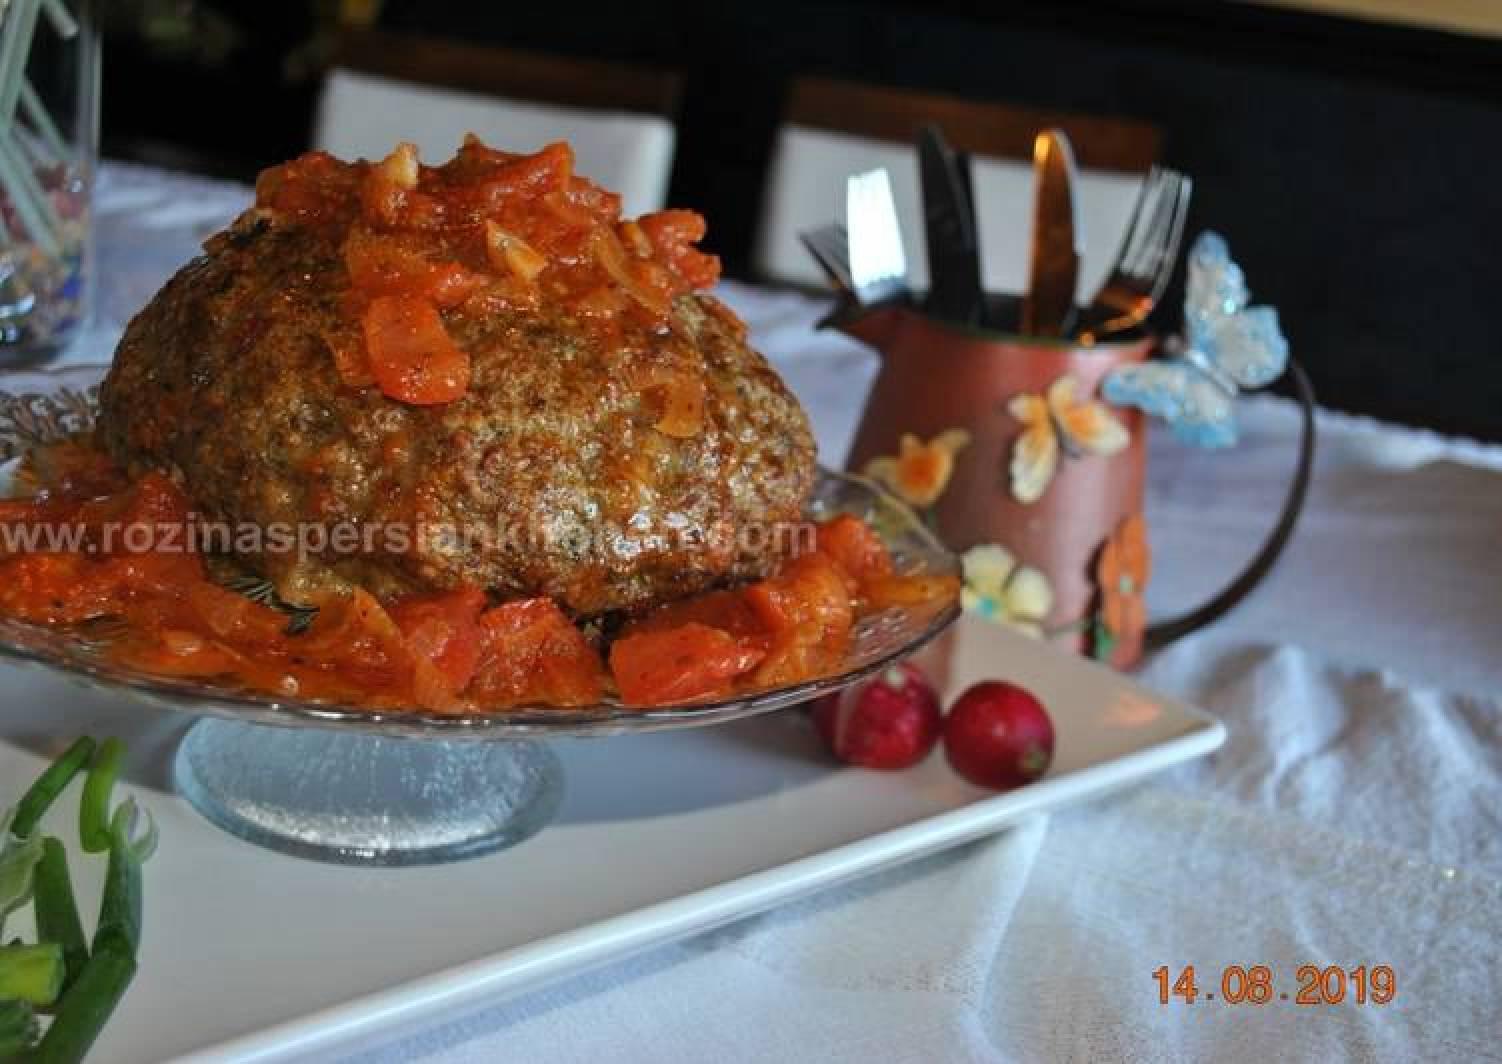 Giant Spaghetti Stuffed Meatball